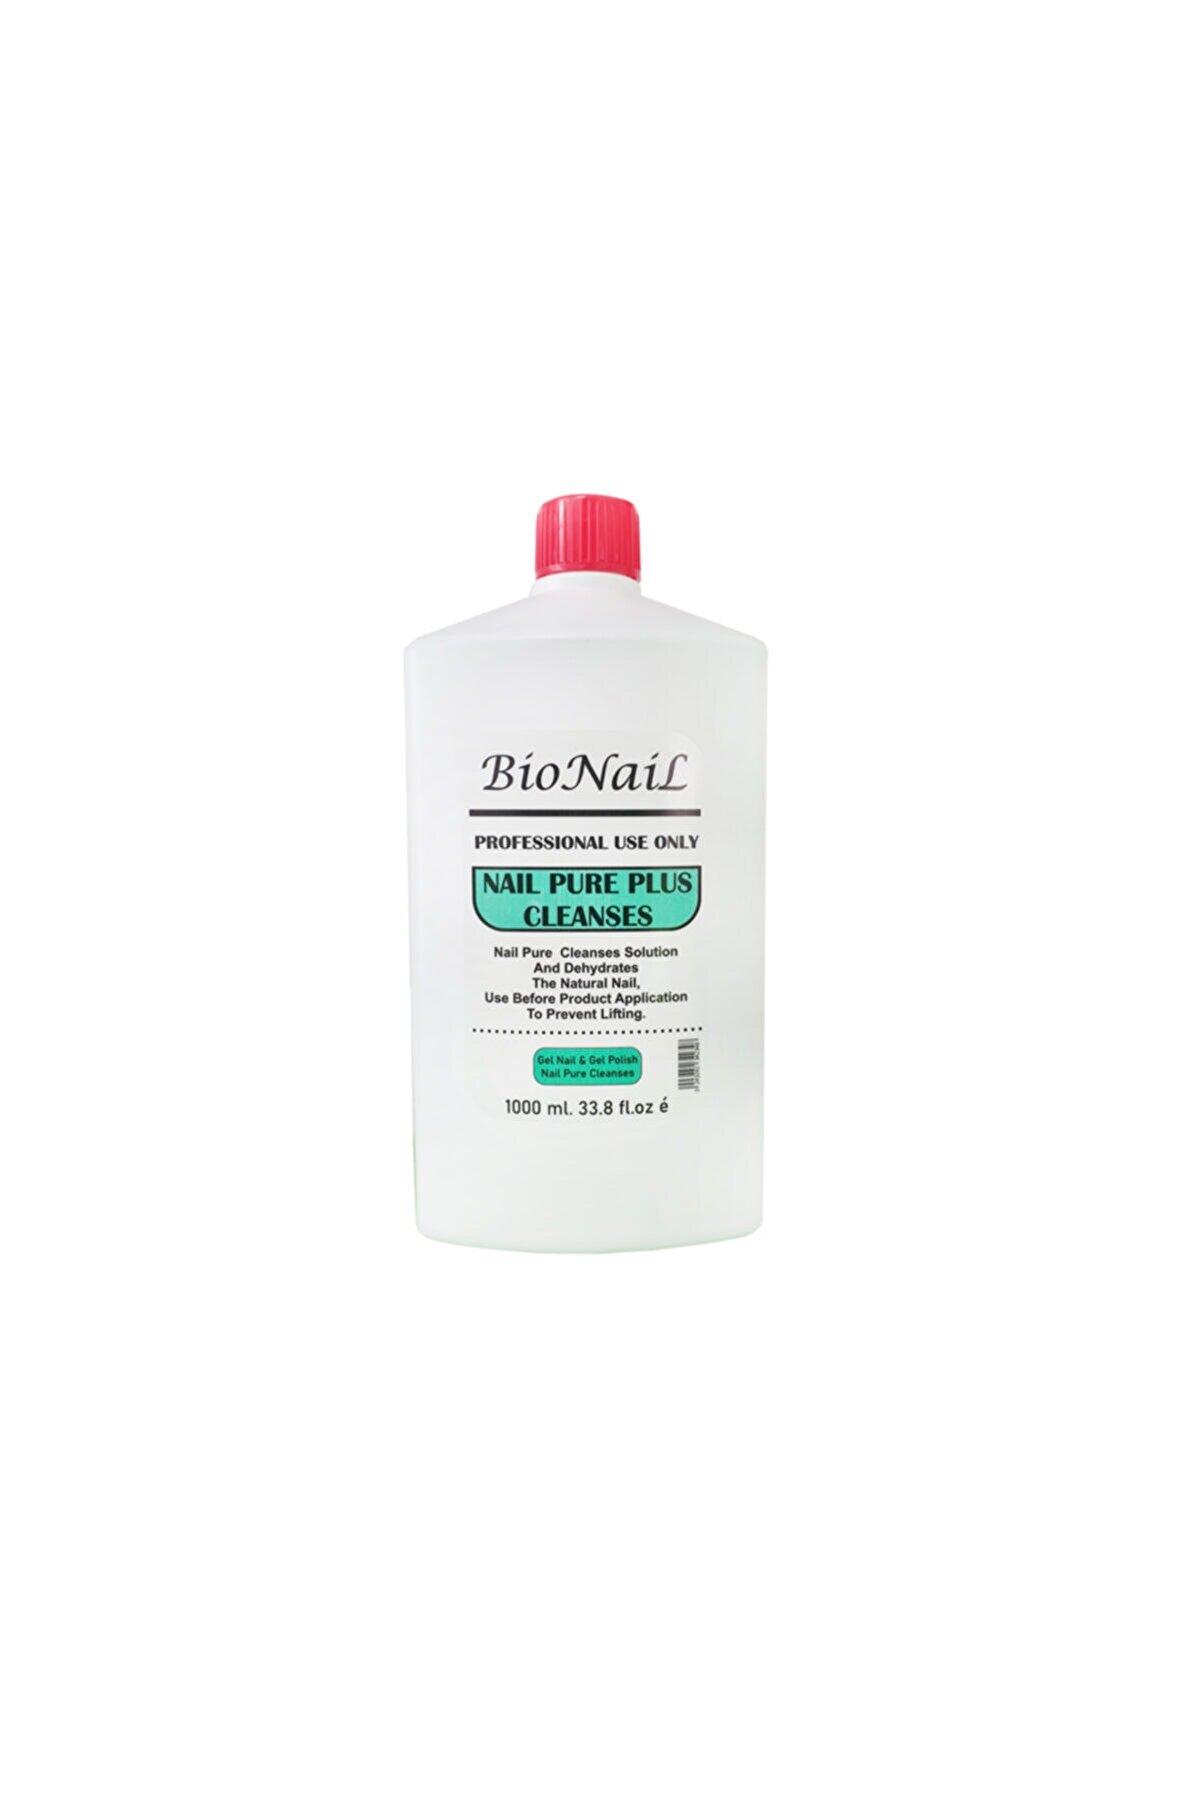 BioNaiL Protez Tırnak Kalıcı Oje İlk Kat Silme Sıvısı Nail Pure 1000 ml